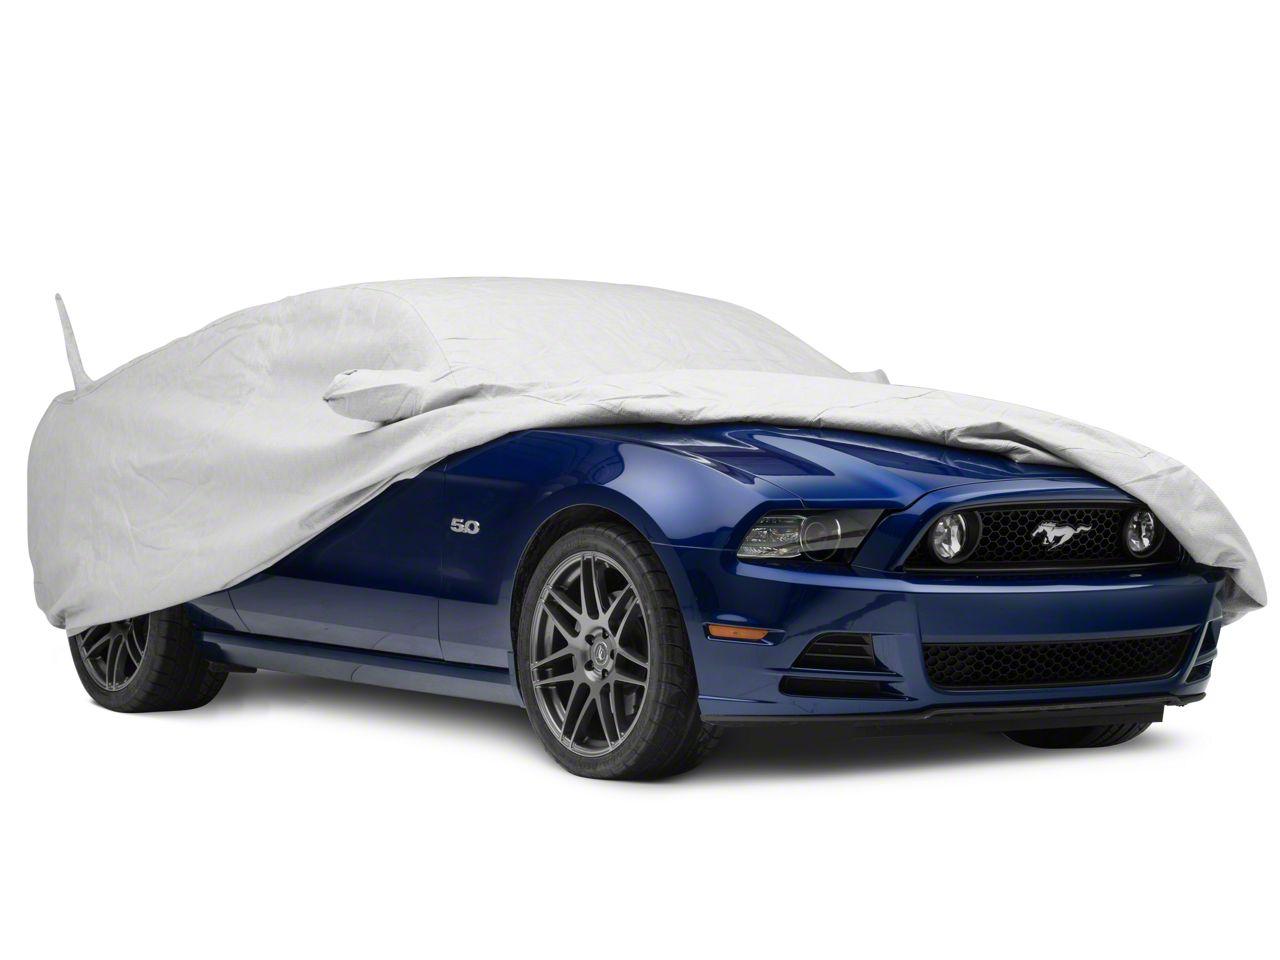 Custom Covercraft Car Covers For Chevrolet Choose Material /& Color